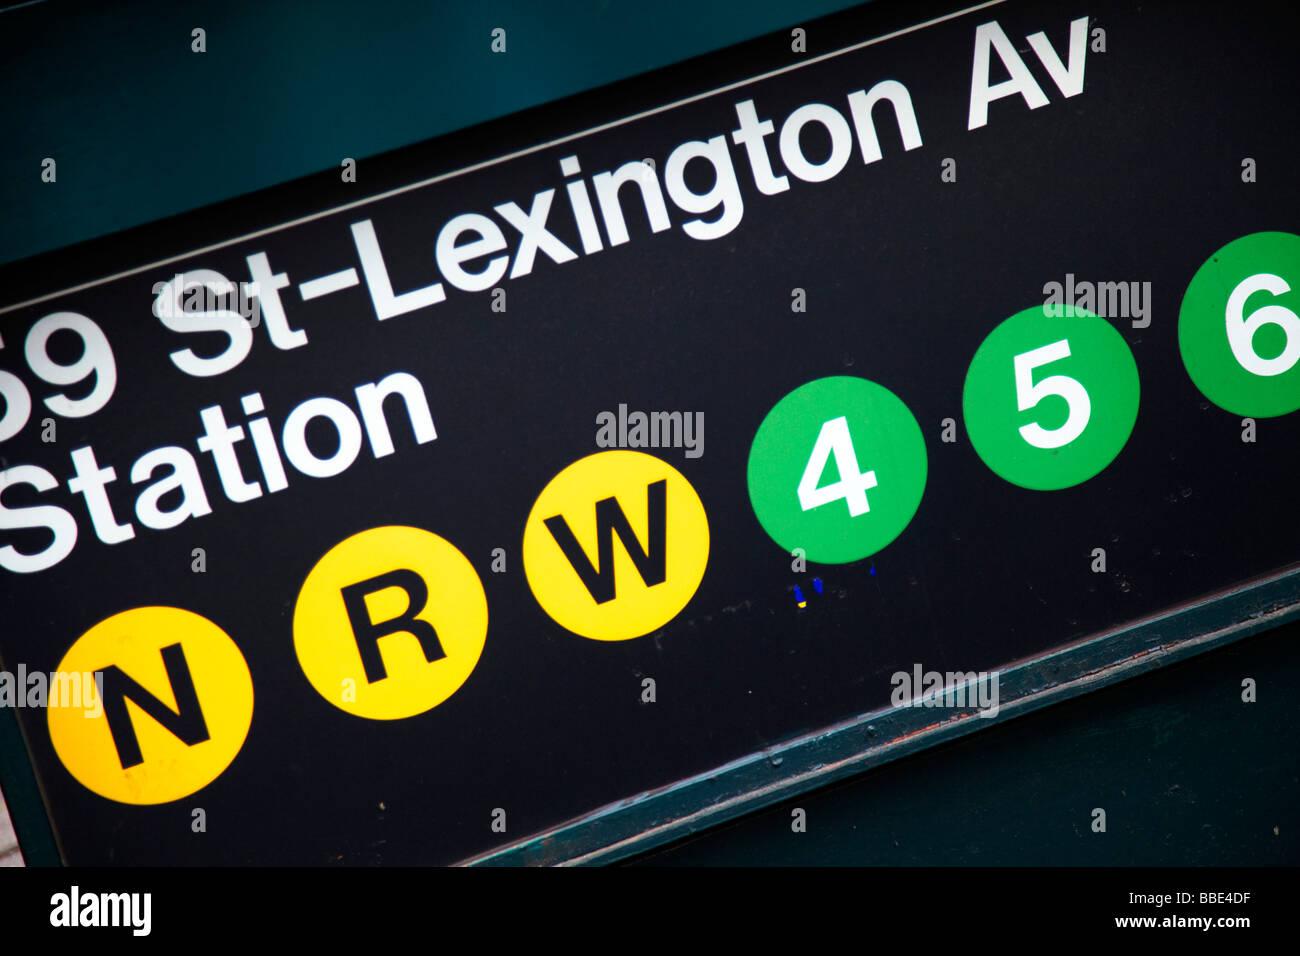 59th St Lex Subway Station New York